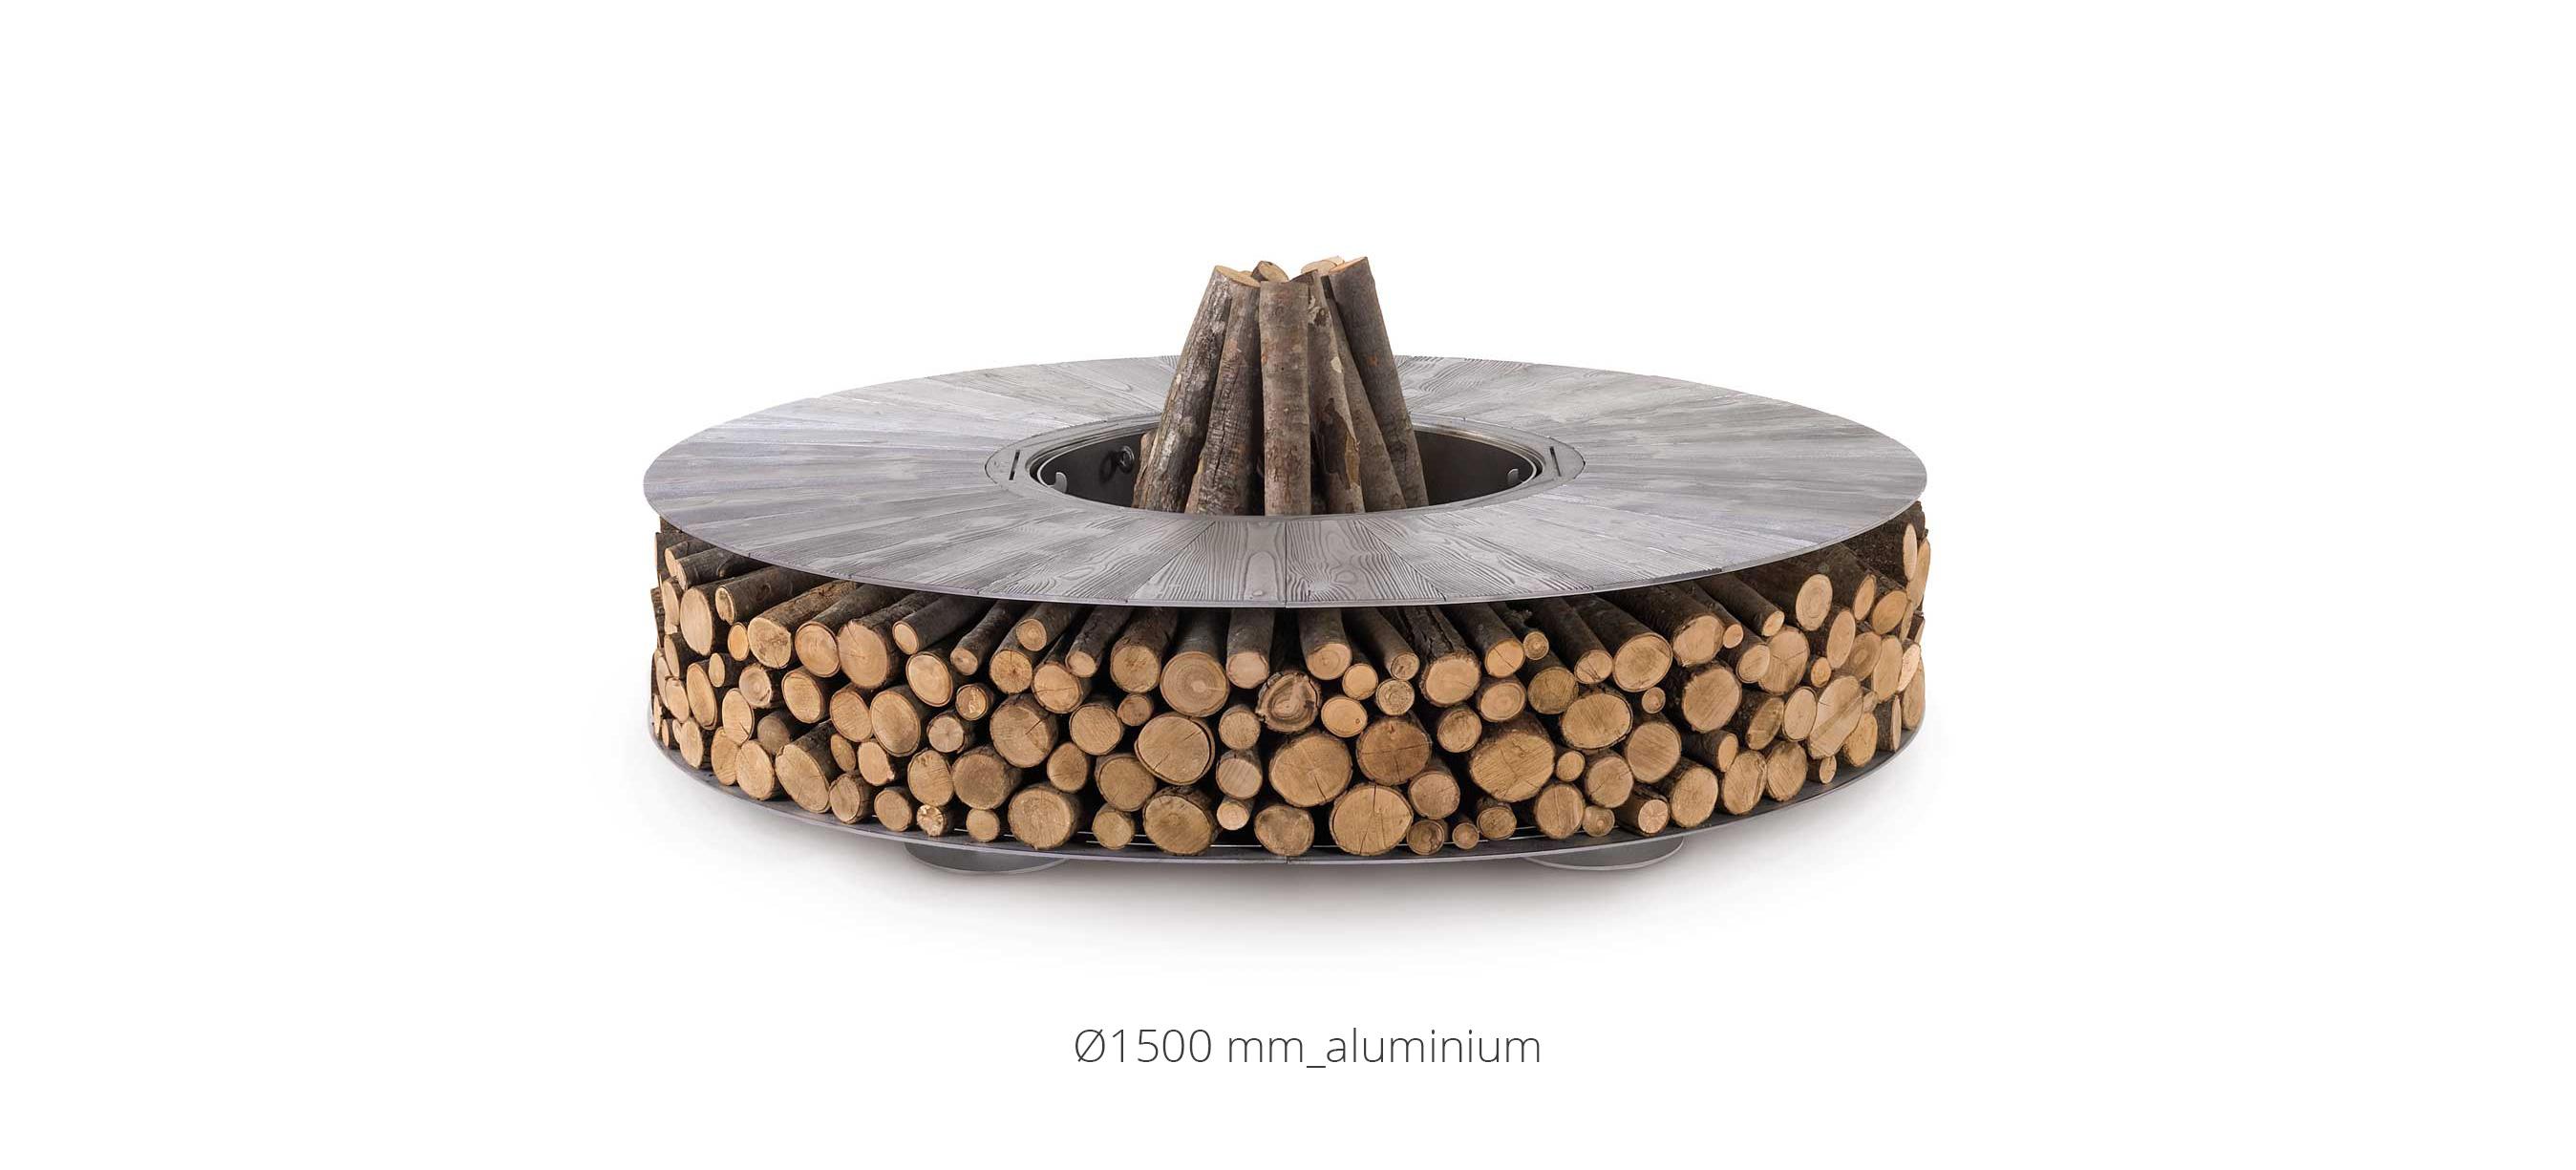 Zero Iron Brown Large Wood-Burning Fire Pit